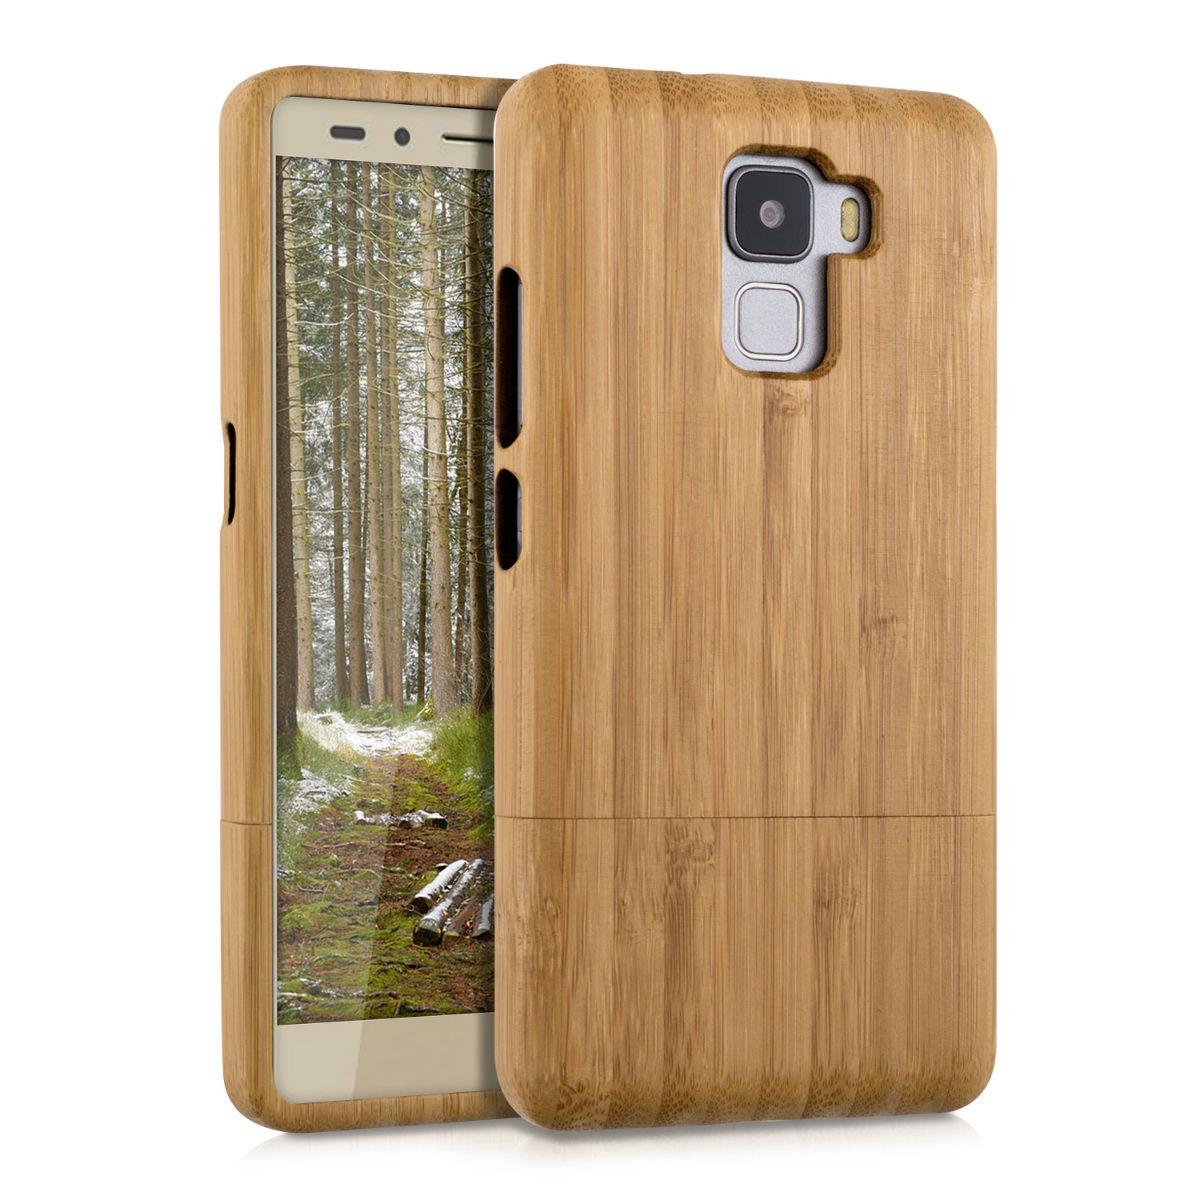 Pouzdro pro Huawei Honor 7 bambus